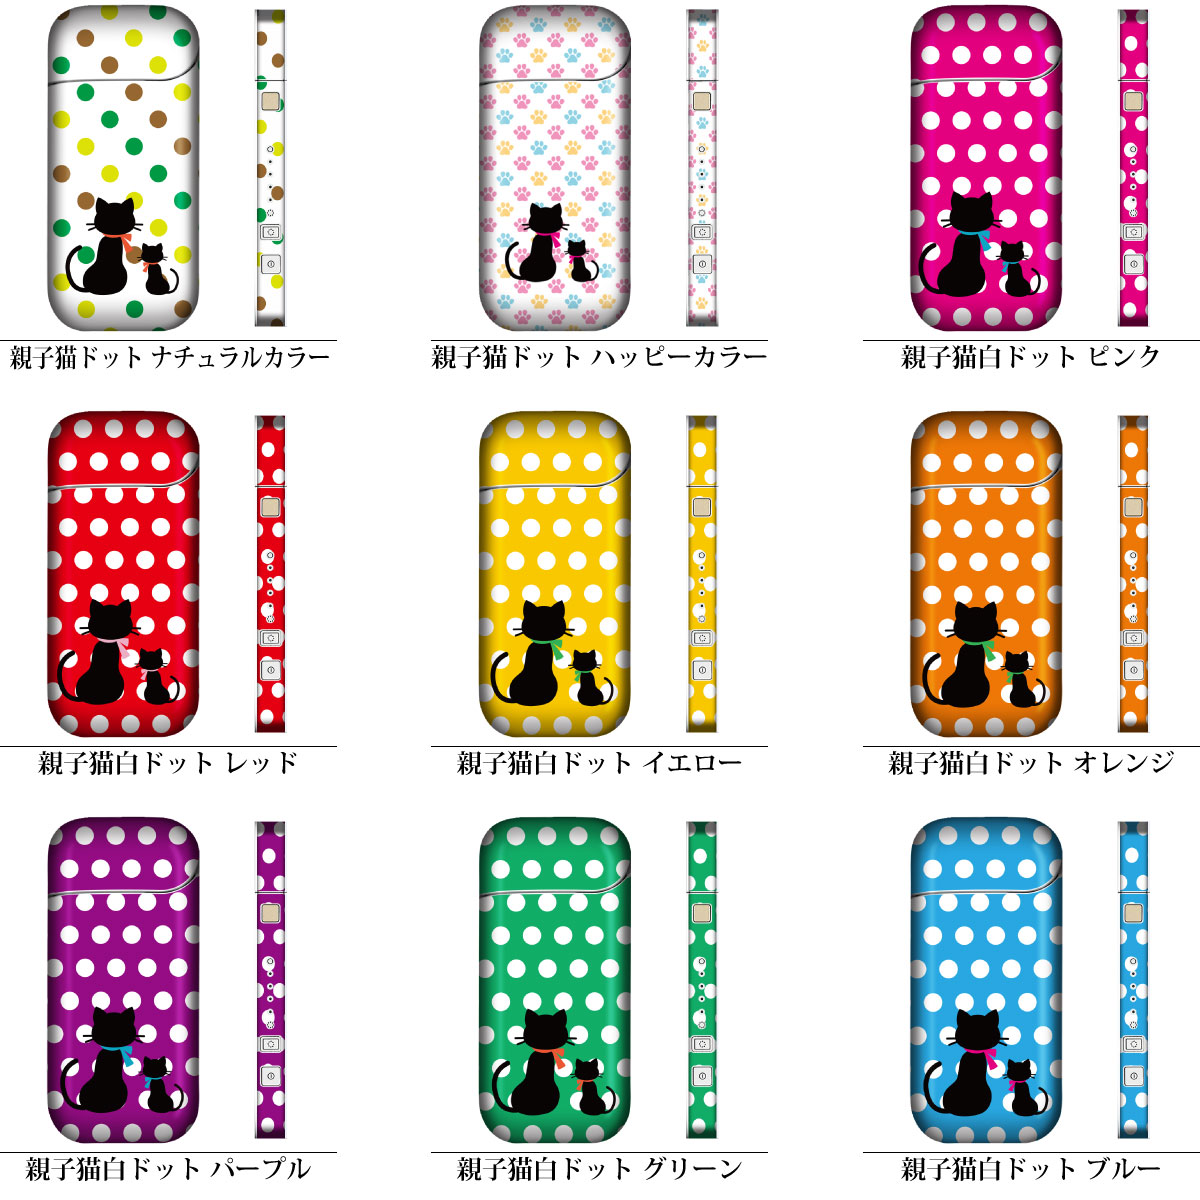 iQOS(アイコス) 専用 デコレーション スキンシール 表面・裏面&側面セット 【 親子猫ドット シリーズ 】